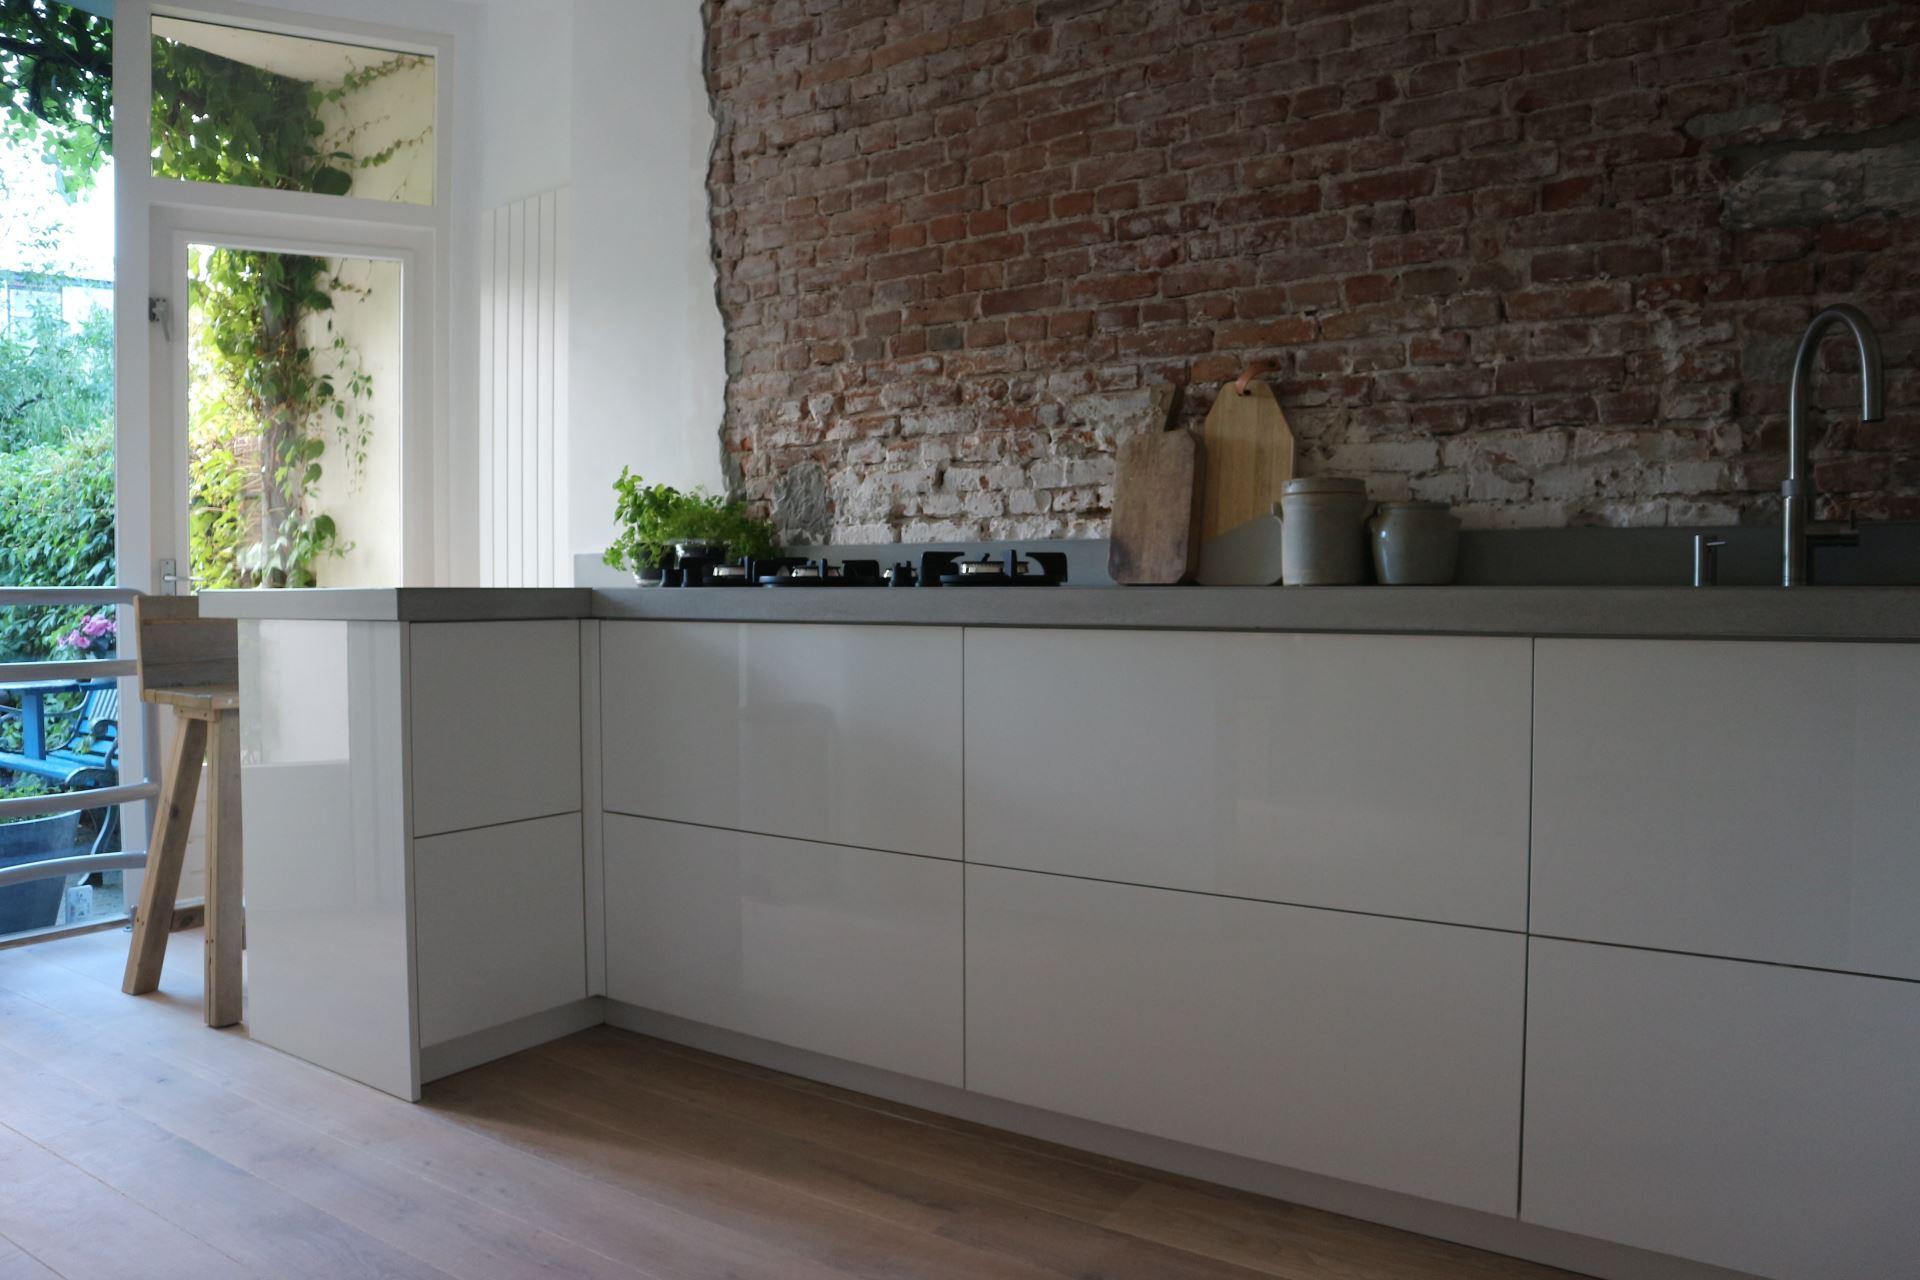 Hoogglans Witte Keuken : Moderne keukens das keukens